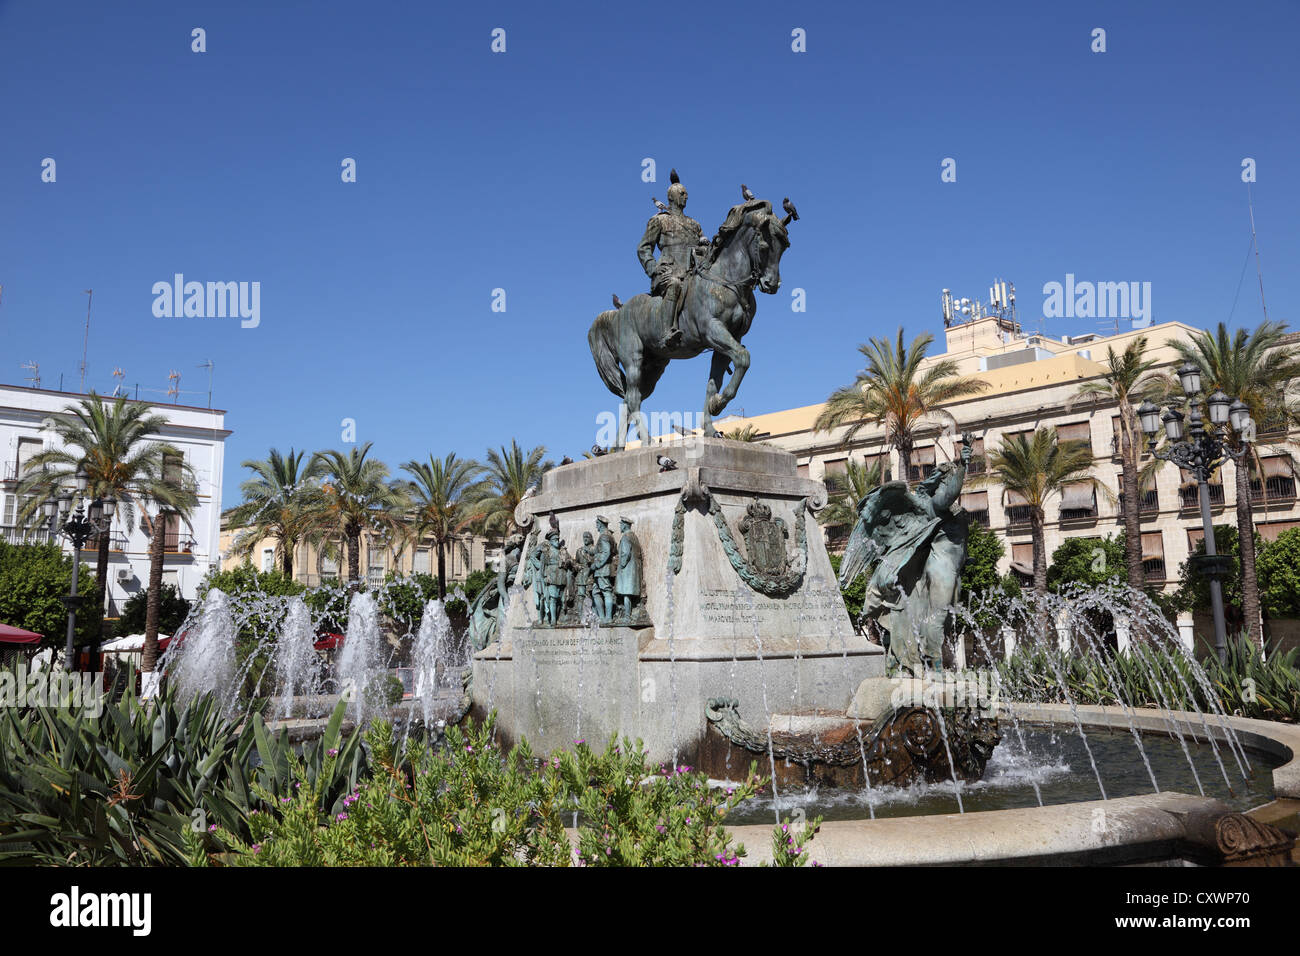 Statue mit Springbrunnen in Jerez De La Frontera, Andalusien Spanien Stockbild